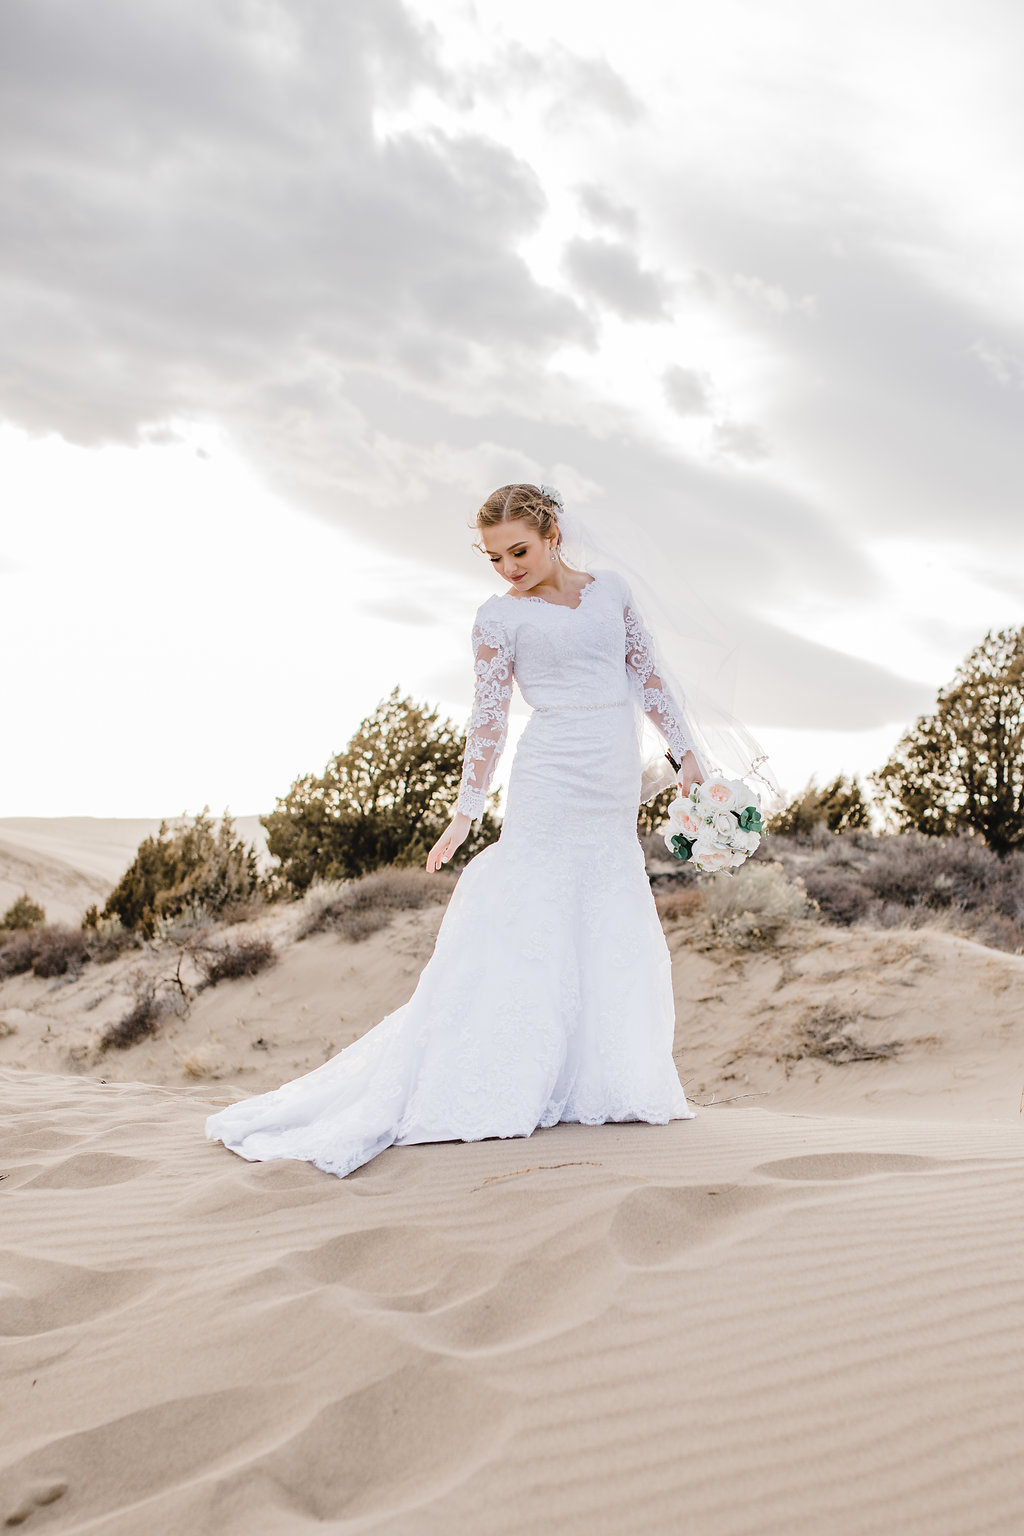 sand dunes rexburg bridals photography outdoor adventurous natural posing wedding photographer calli richards